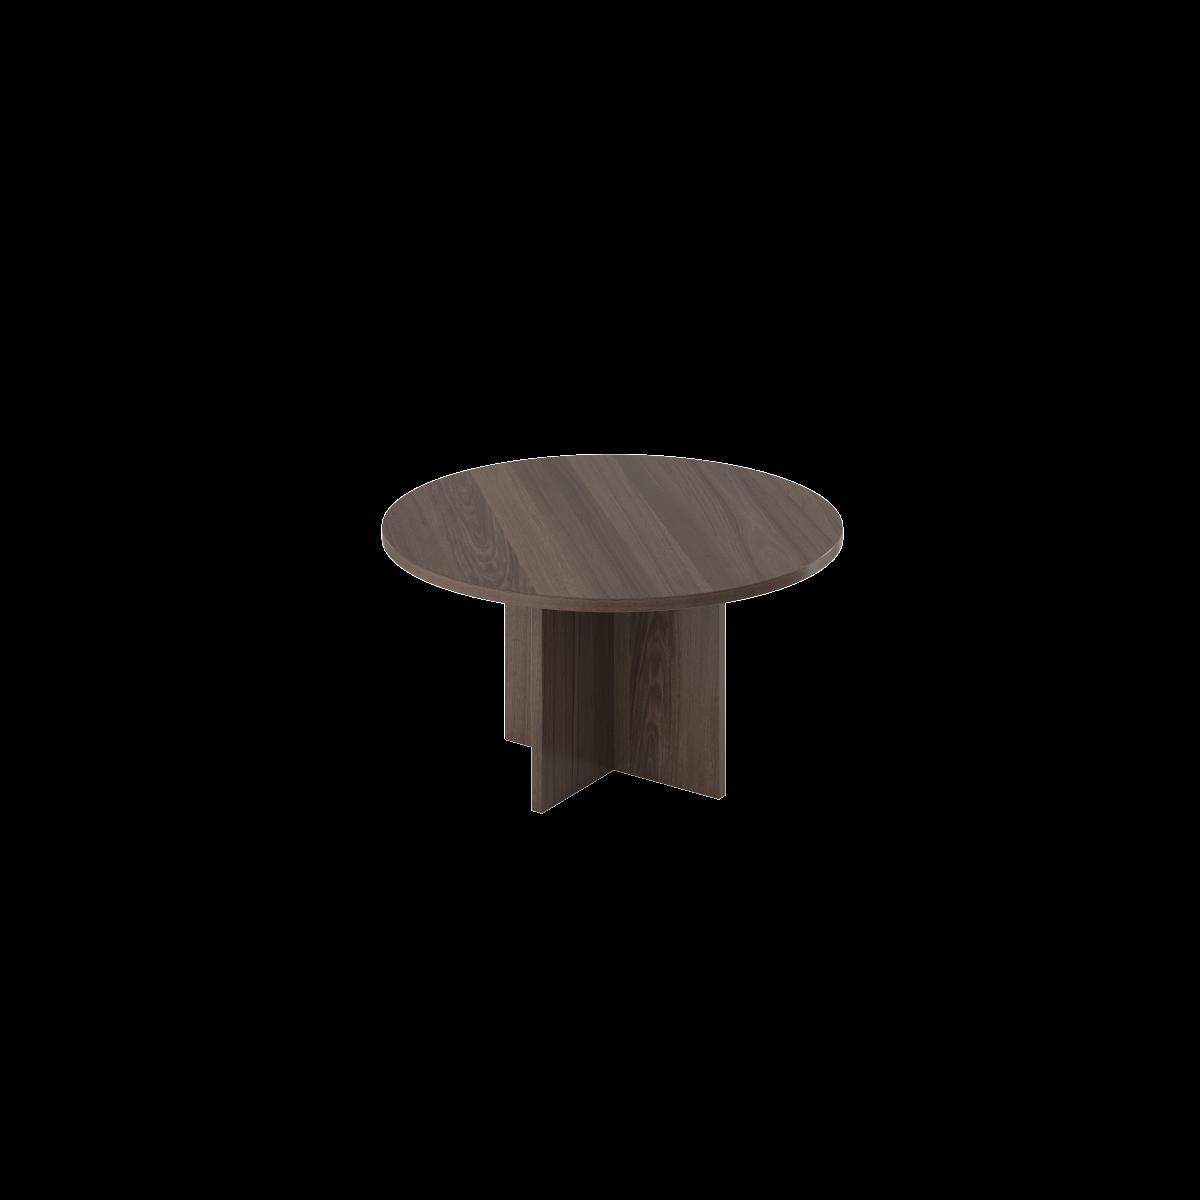 Стол журнальный А-039 (800х800х430). гарбо